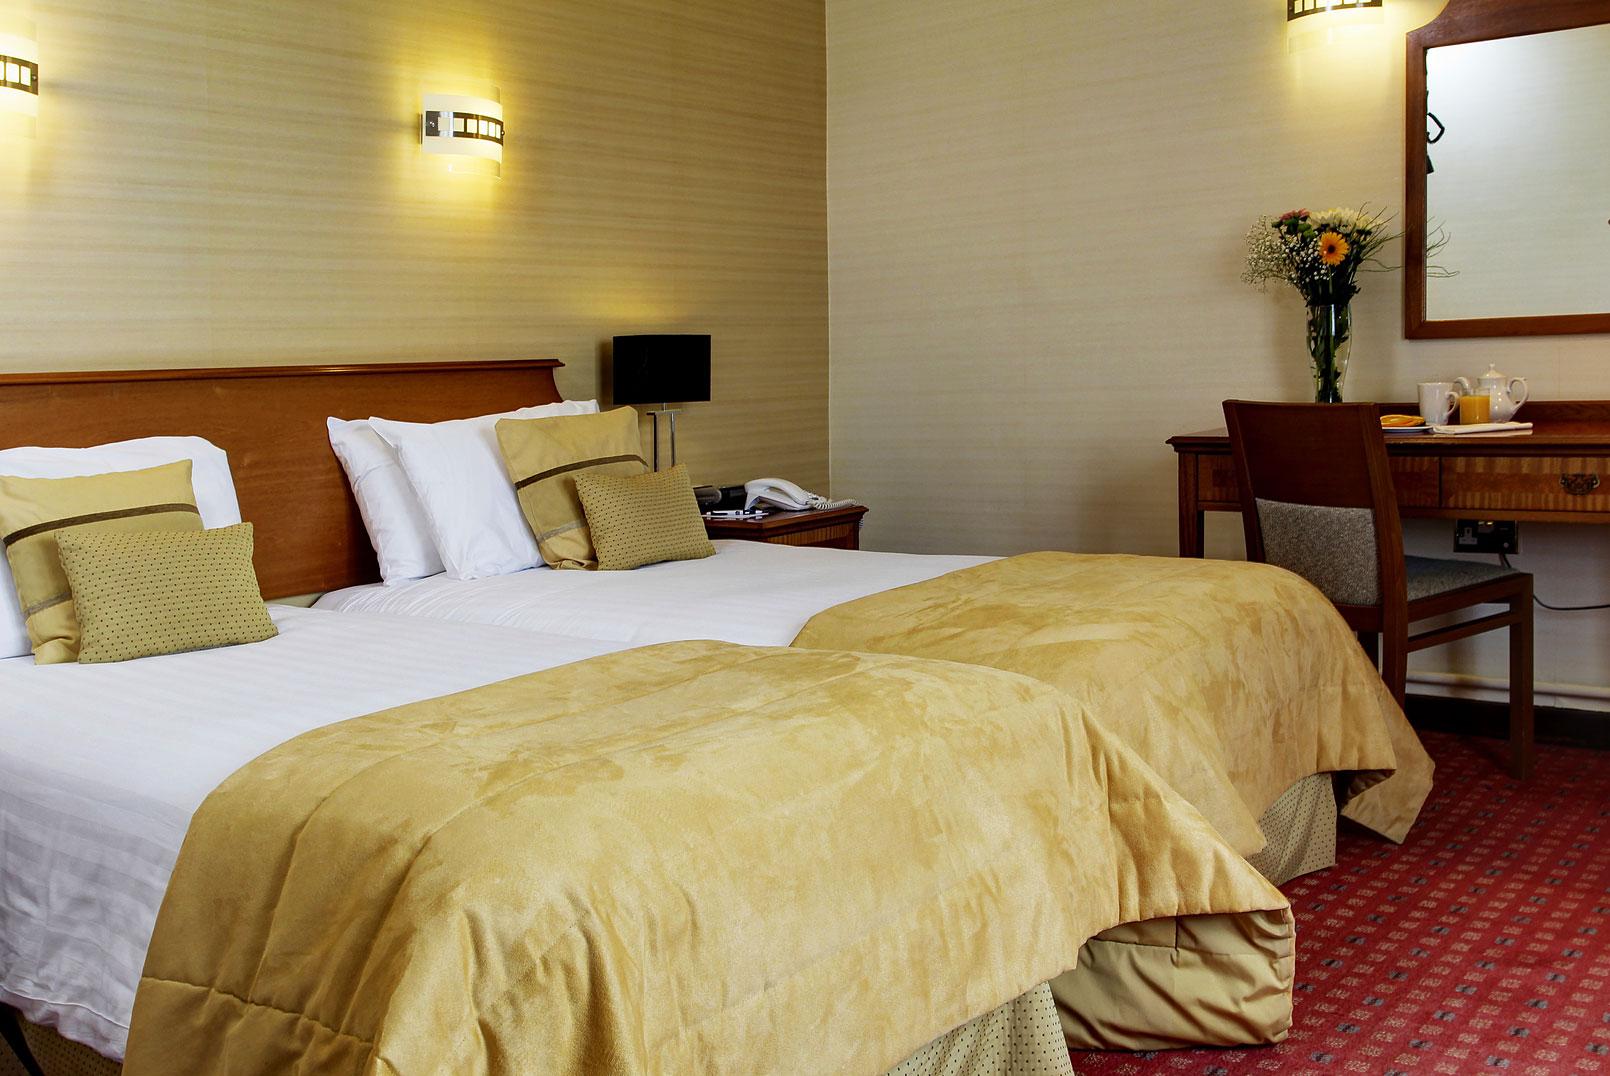 Best Western Aberavon Beach Hotel | Hotels in Swansea, South Wales